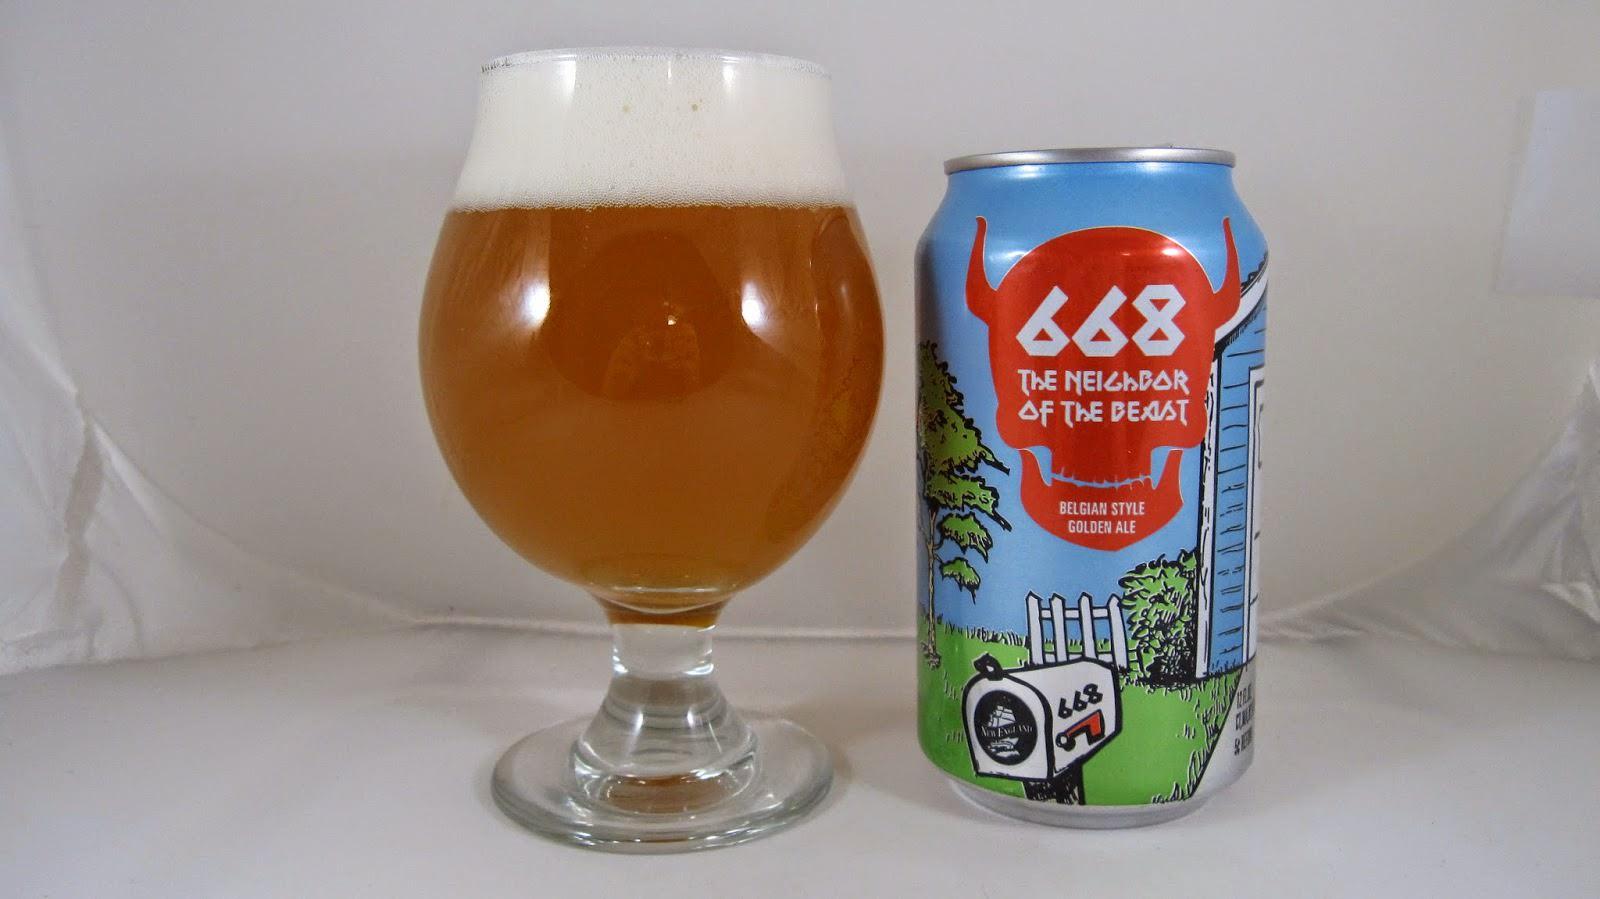 new-england-668-neighbor-of-the-beast-001